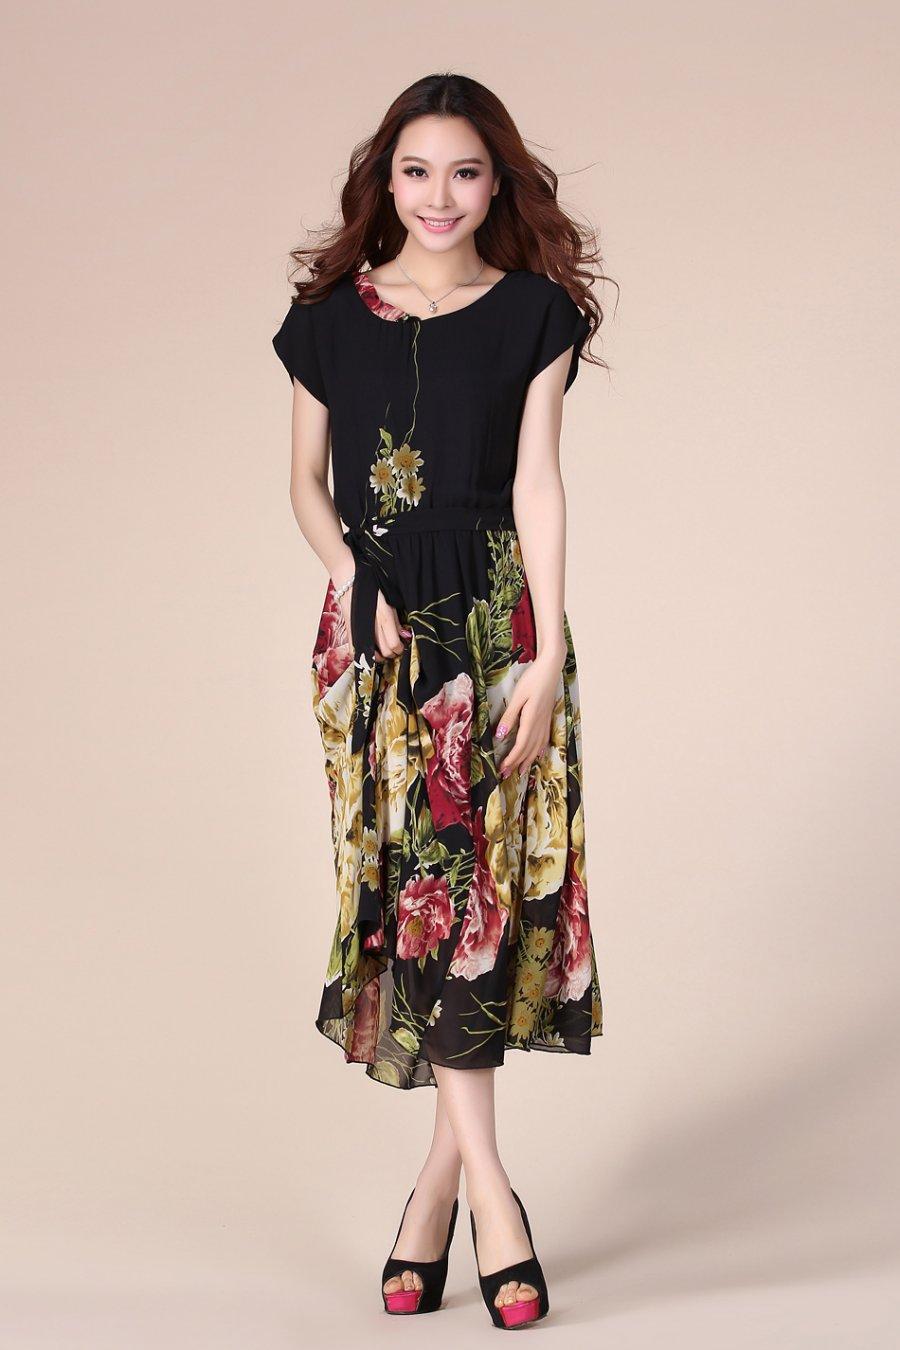 Duchess Fashion: Malaysia Online Clothes Shopping: Big